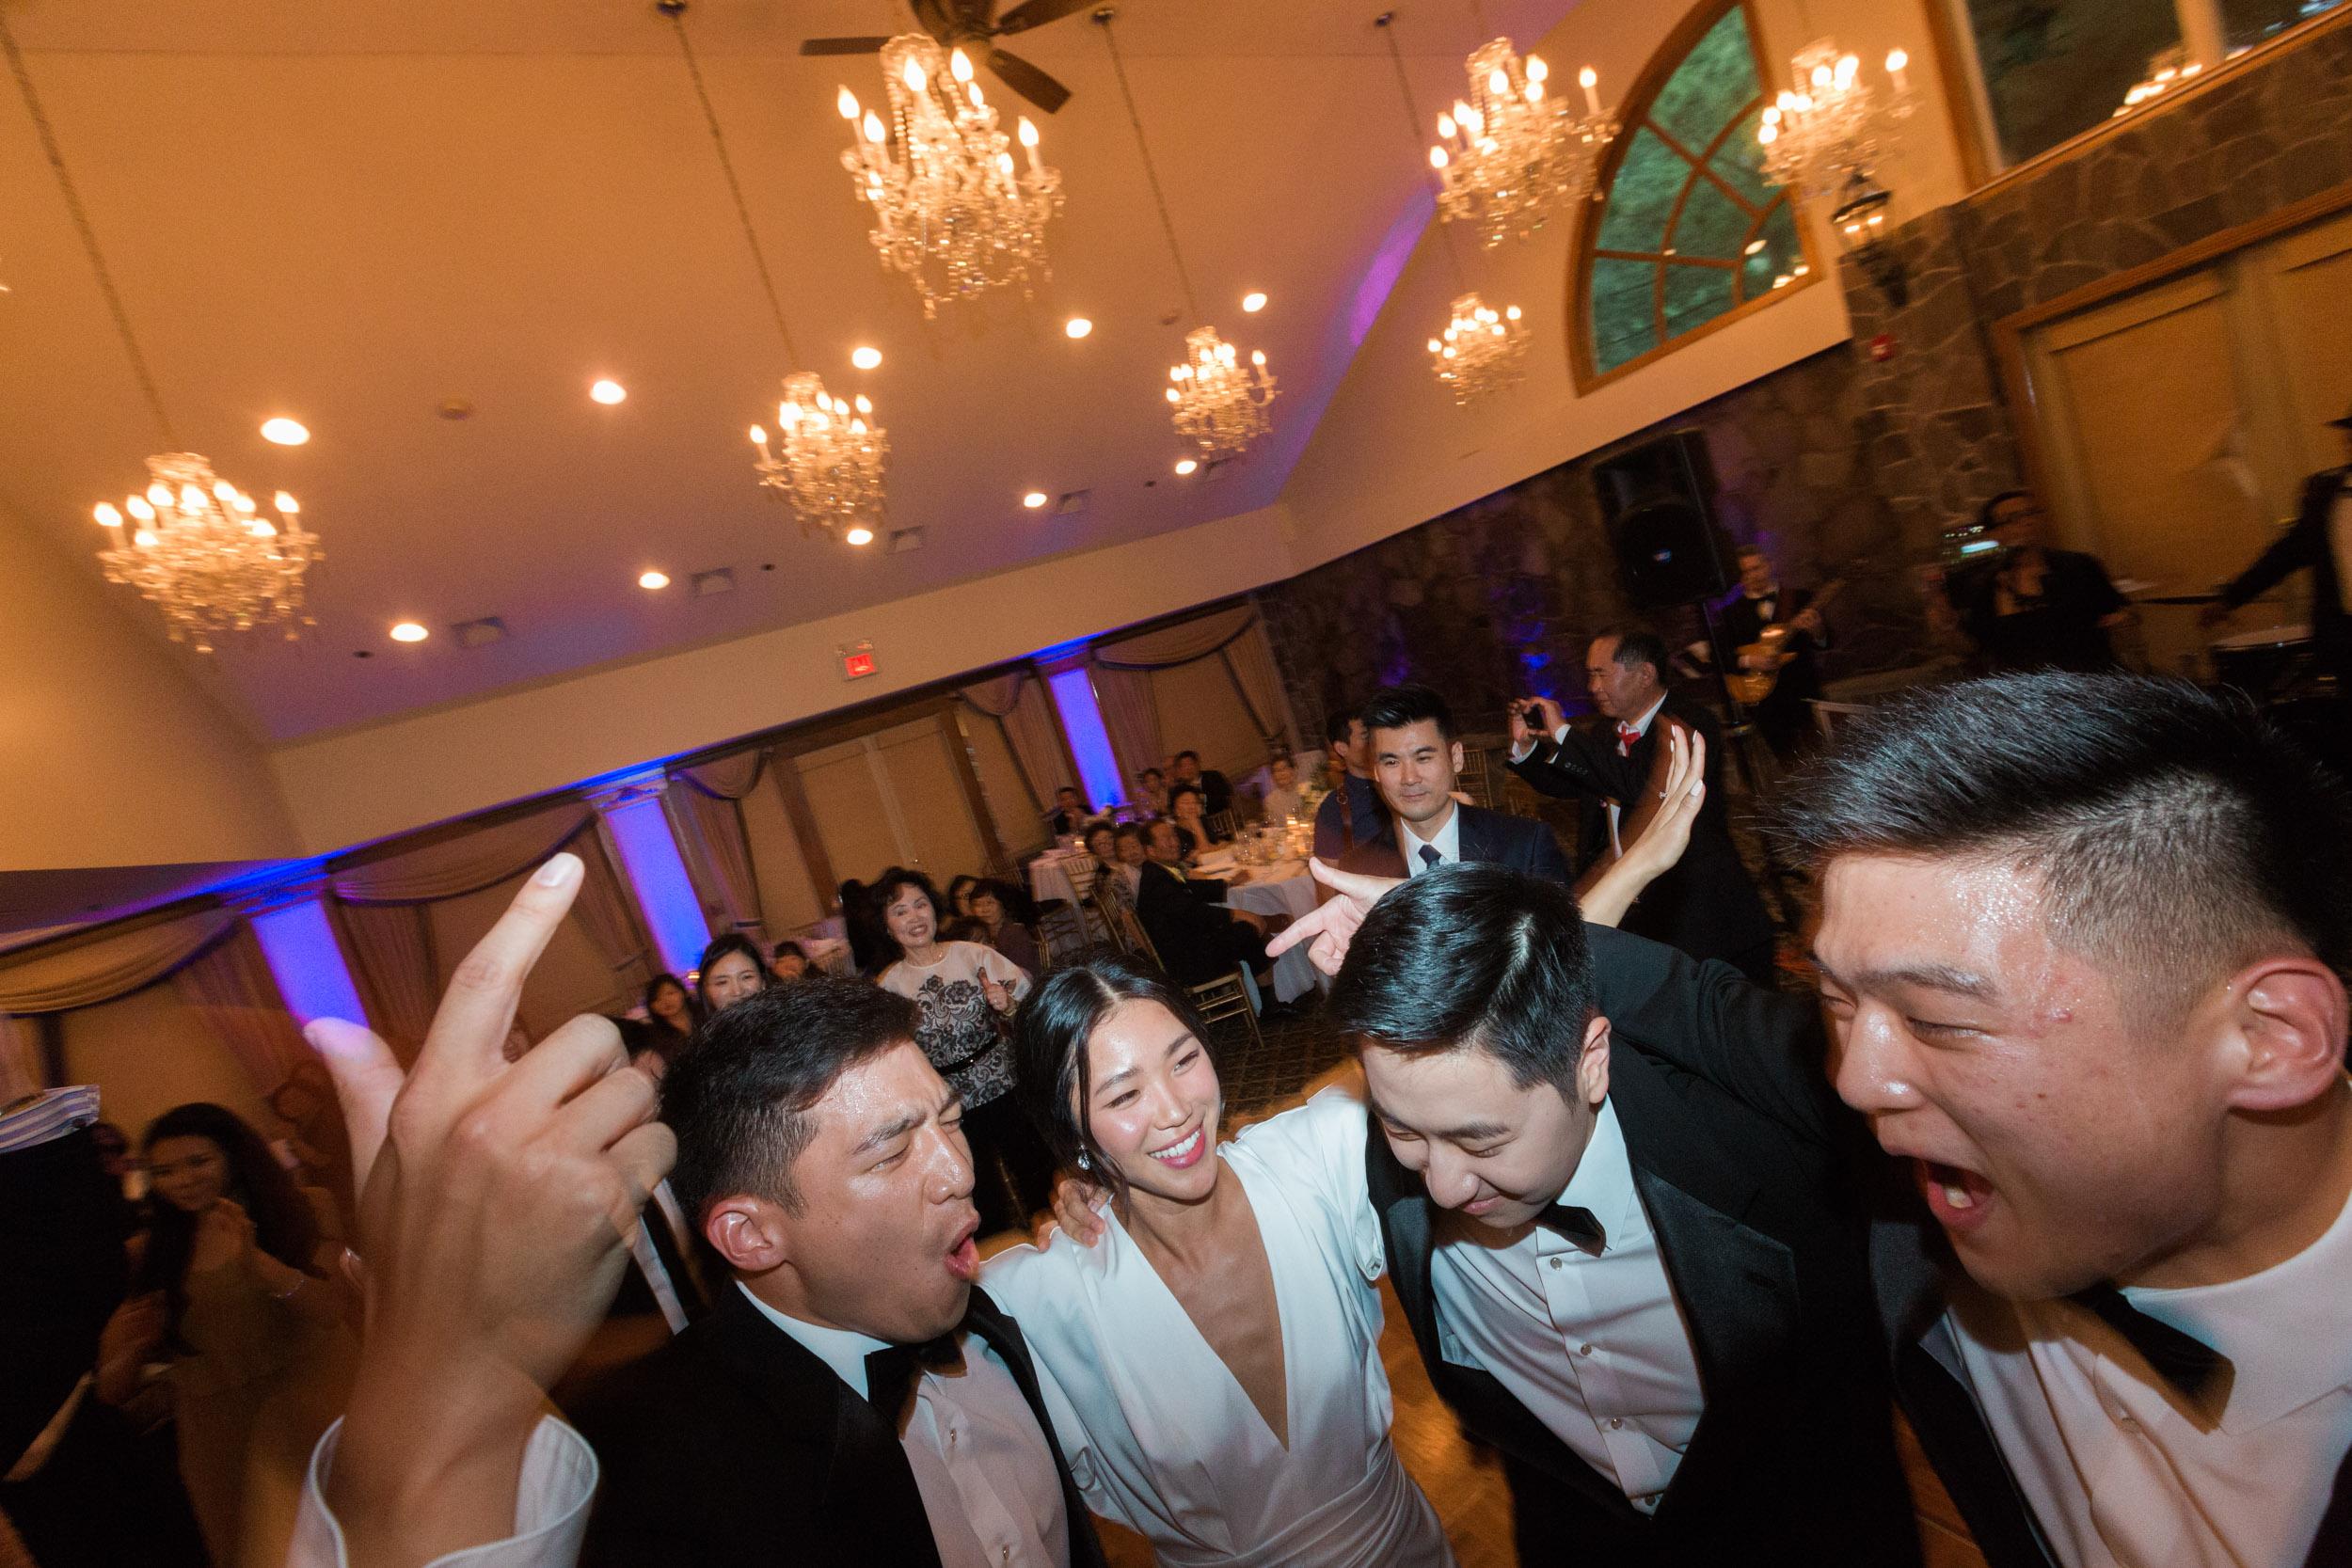 jean-arnold-wedding-0050.jpg